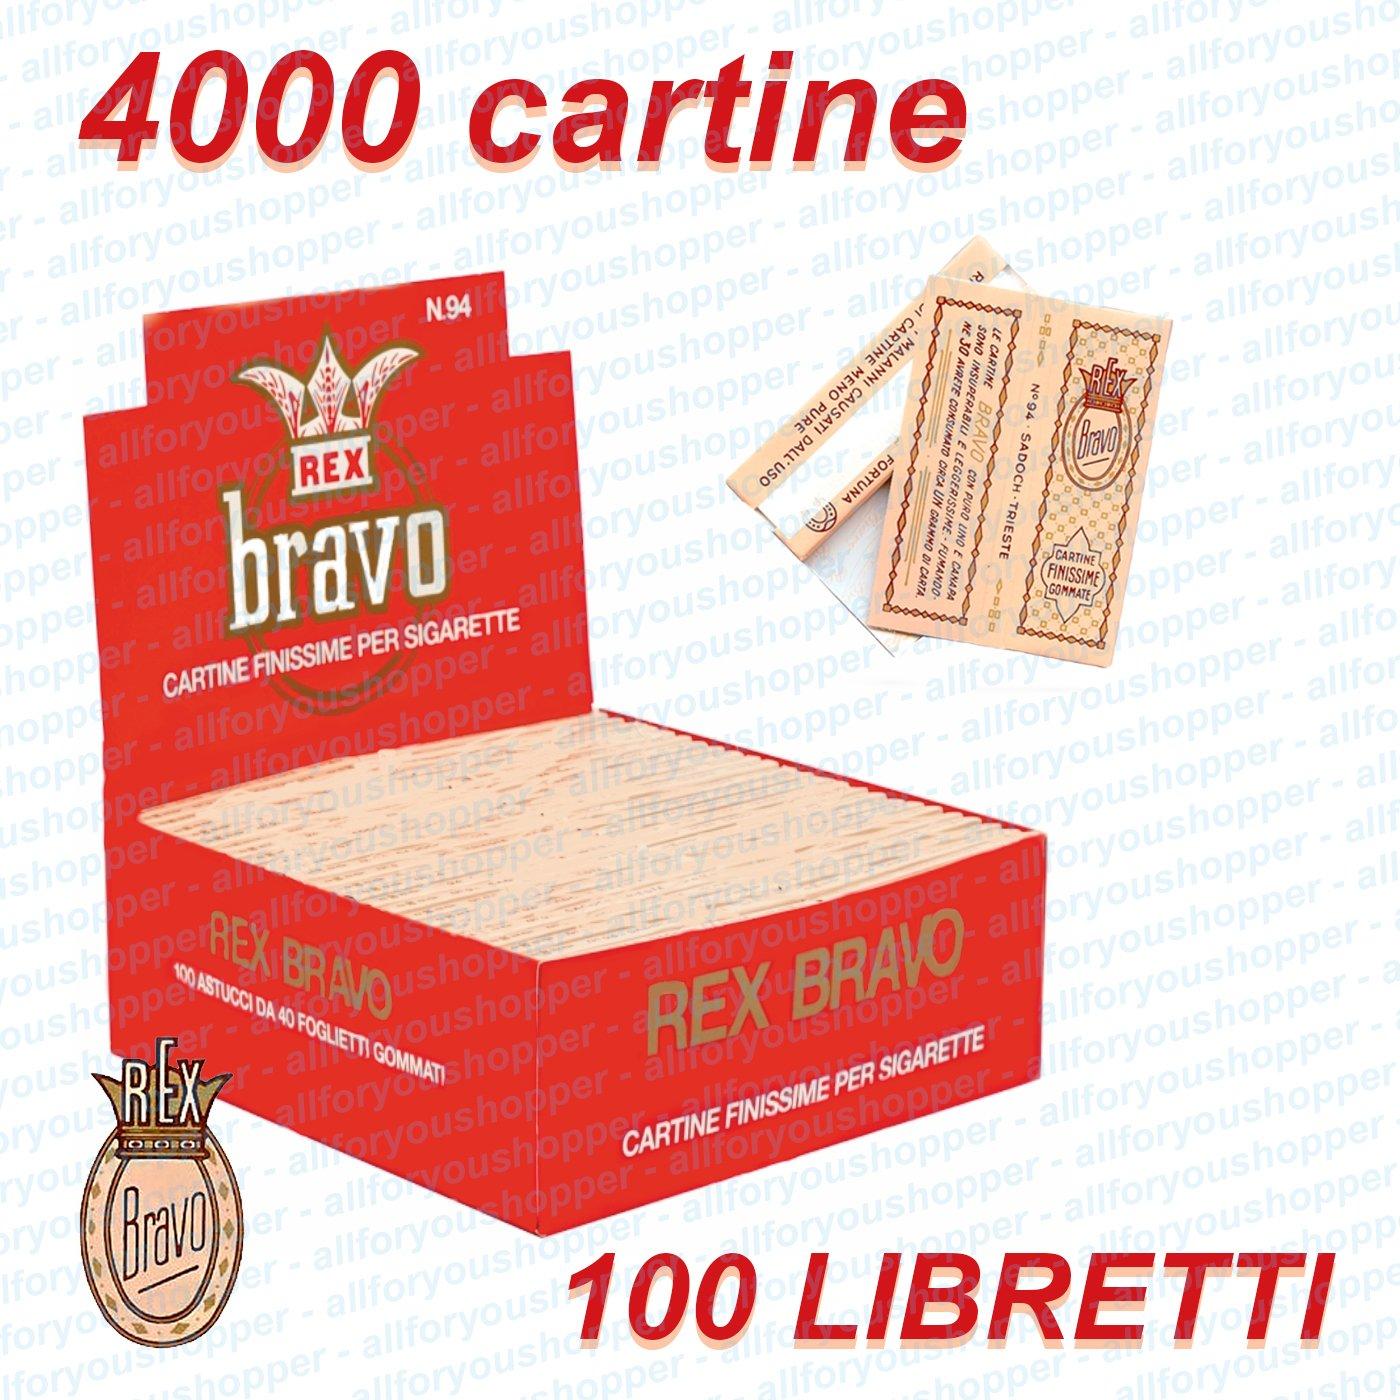 cartine bravo rex  CARTINE BRAVO REX Corte 1 Box 100 Libretti 4000 Cartine - EUR 25,80 ...